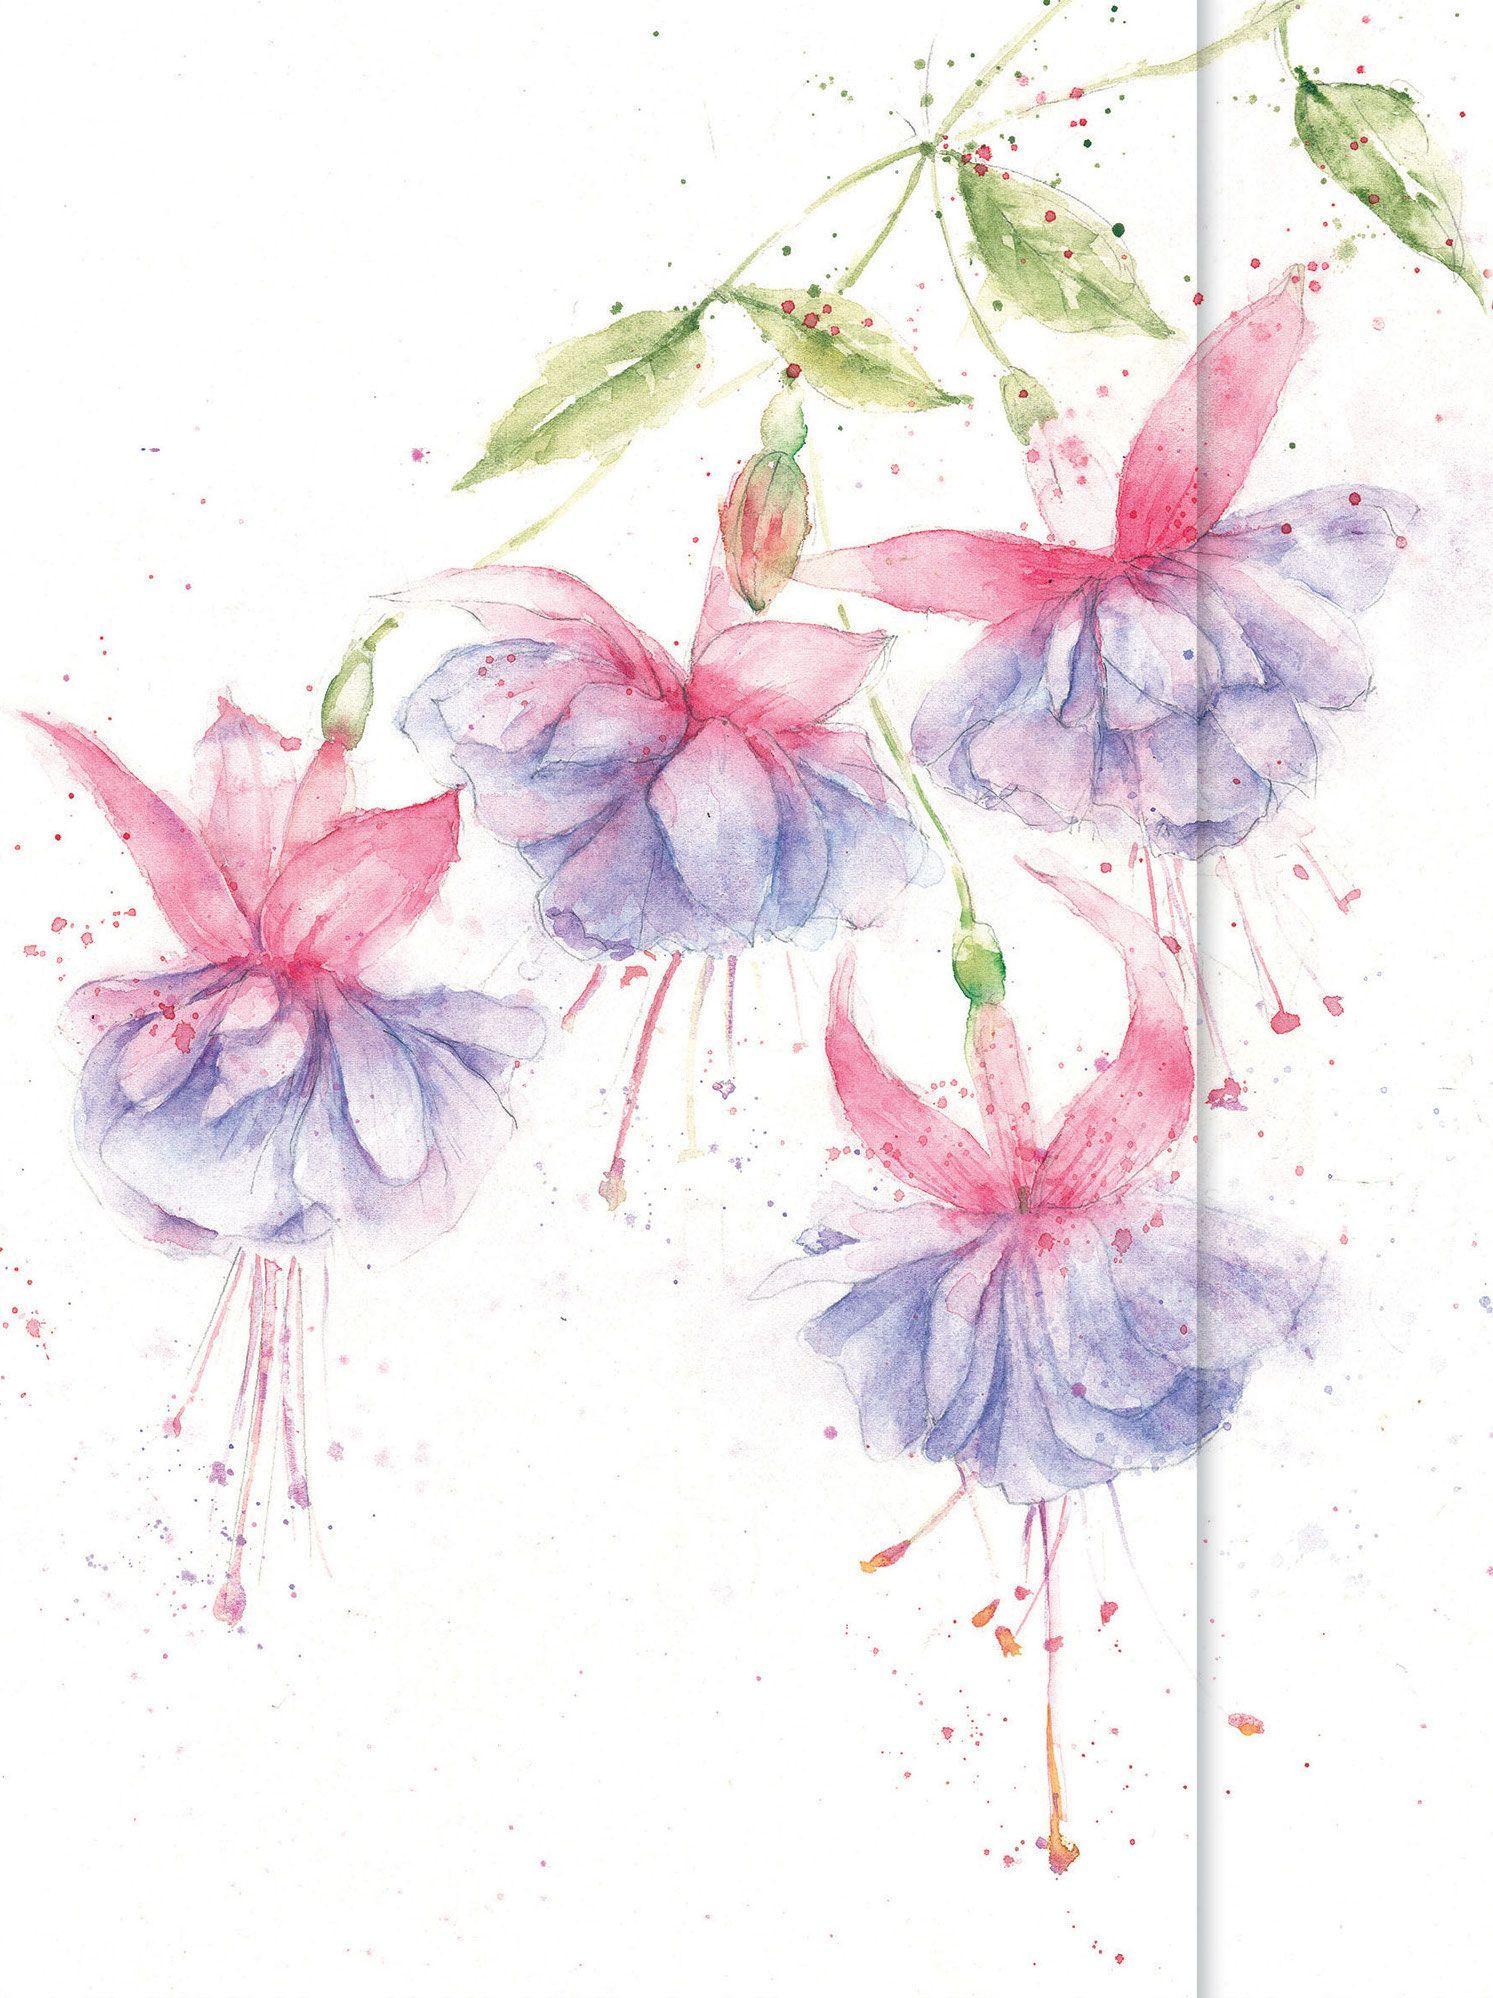 Fuchsia Luxury Card By Rose Eddington Whistlefish Galleries Watercolor Flowers Paintings Shadow Painting Flower Art